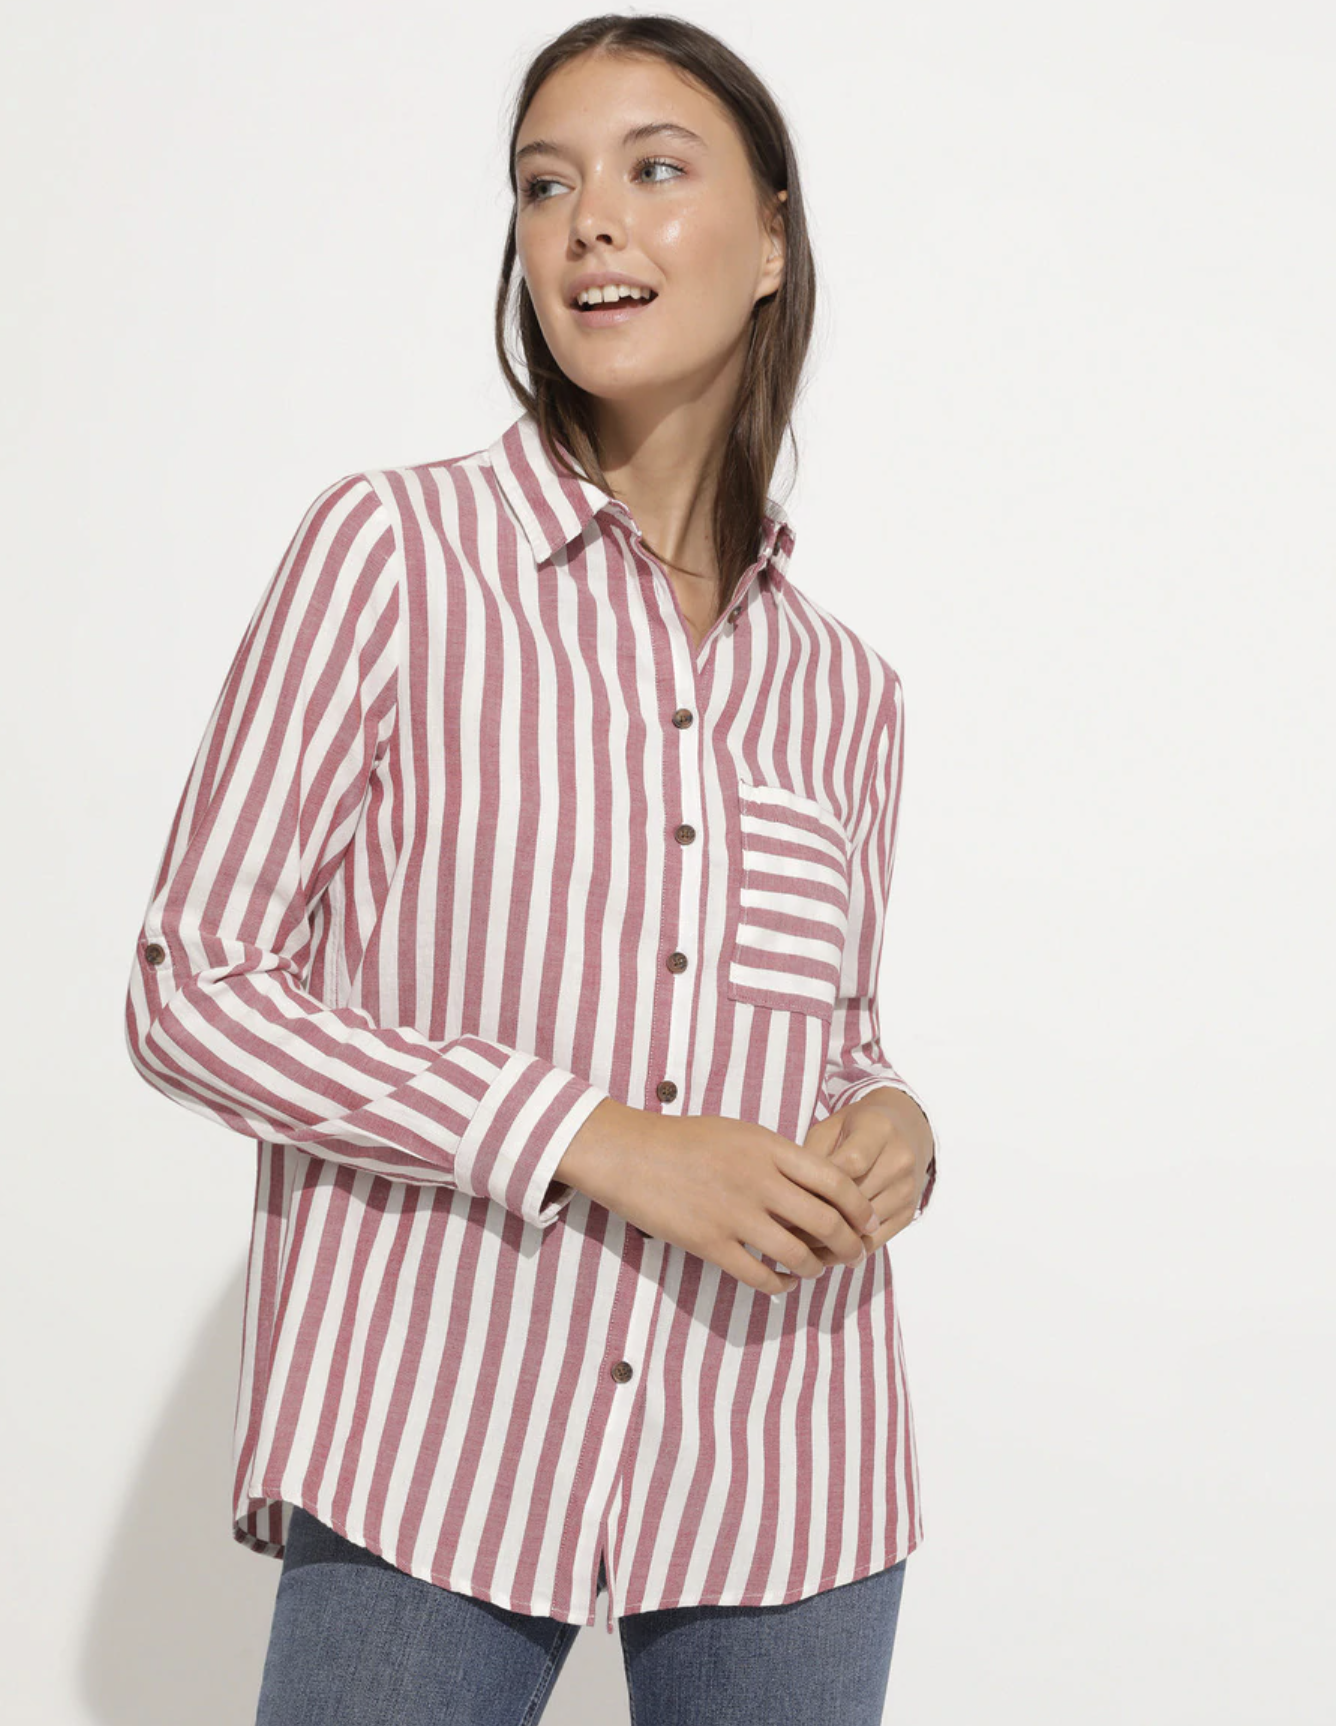 Camisa de mujer rayas manga larga